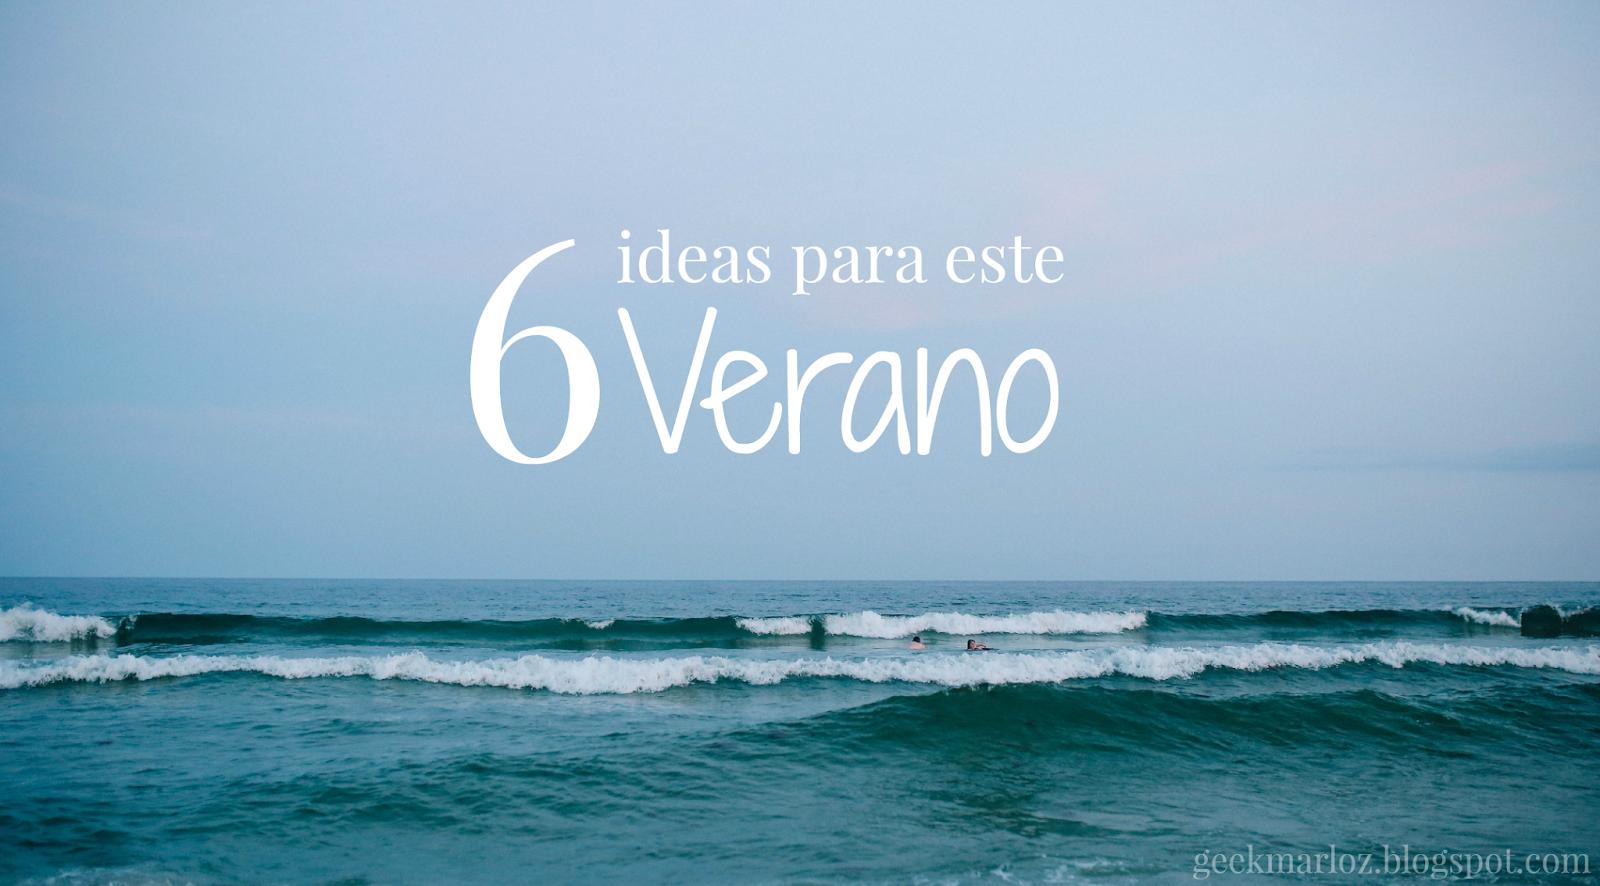 6 ideas para este verano